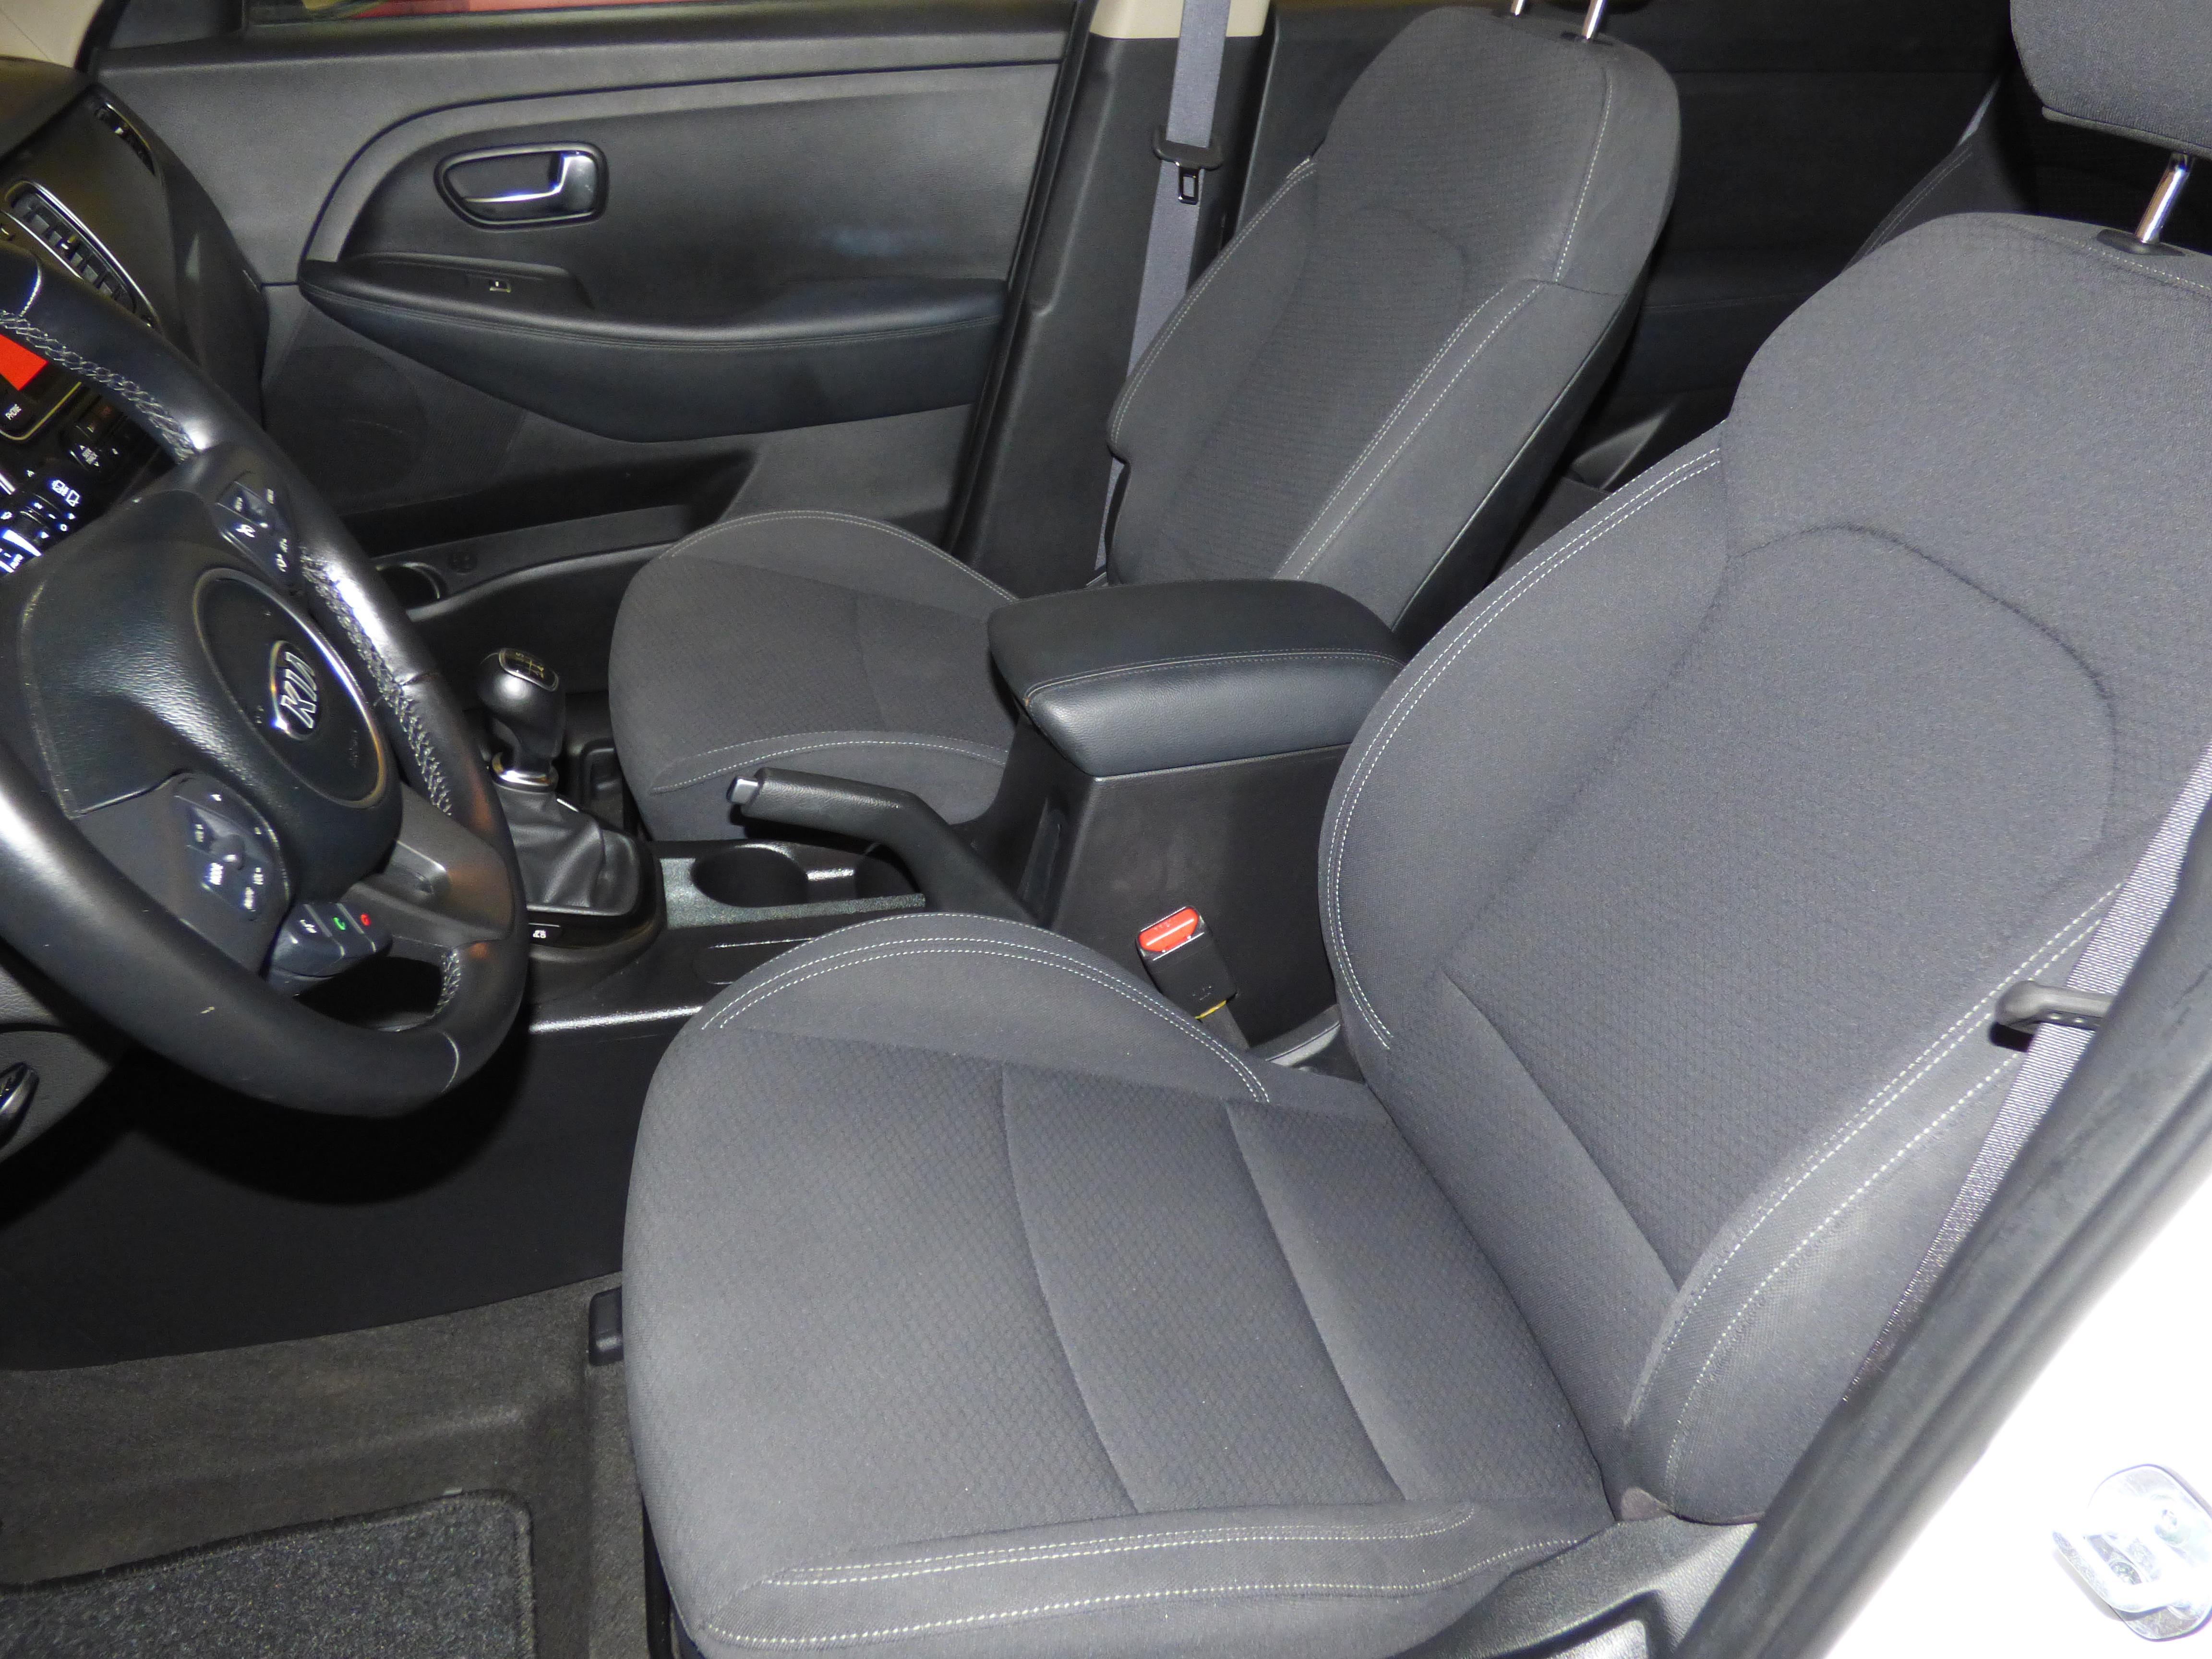 Carens 1.7 CRDI 115CV Concept 7 Plazas 4